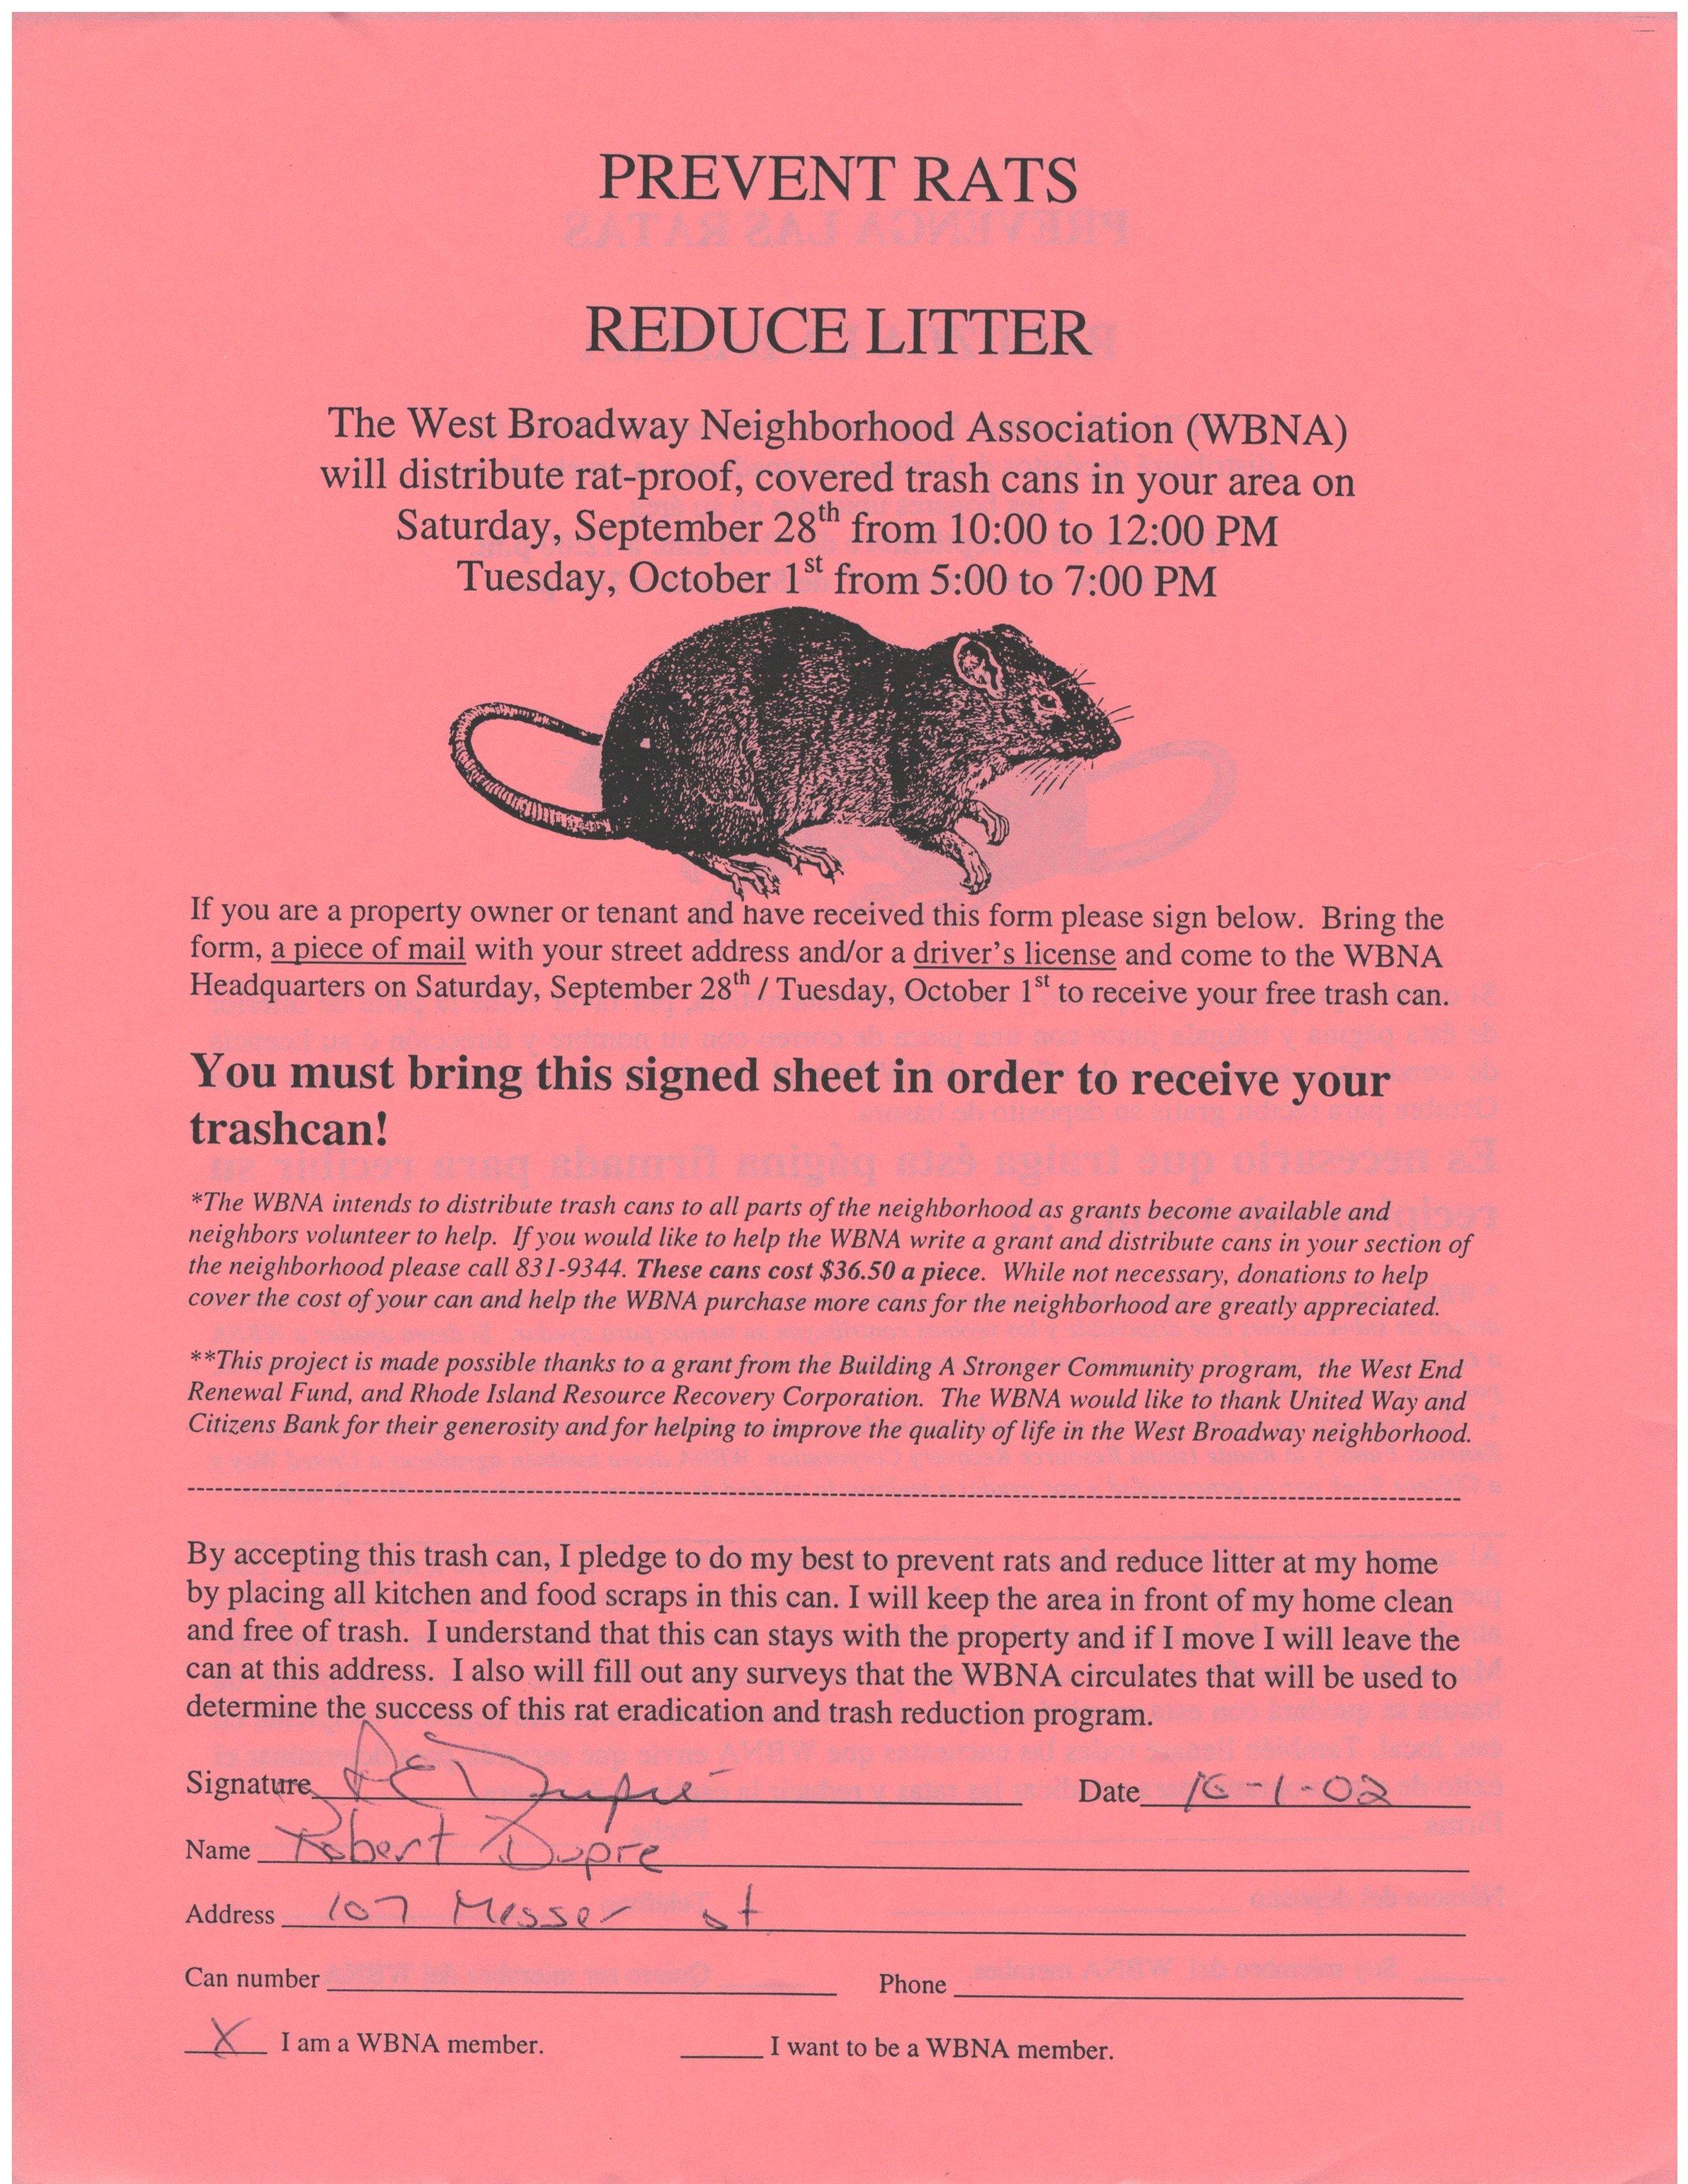 Rat-O-Rama volunteers went door to door distributing multi-lingual flyers and sign up forms to neighbors (2002)